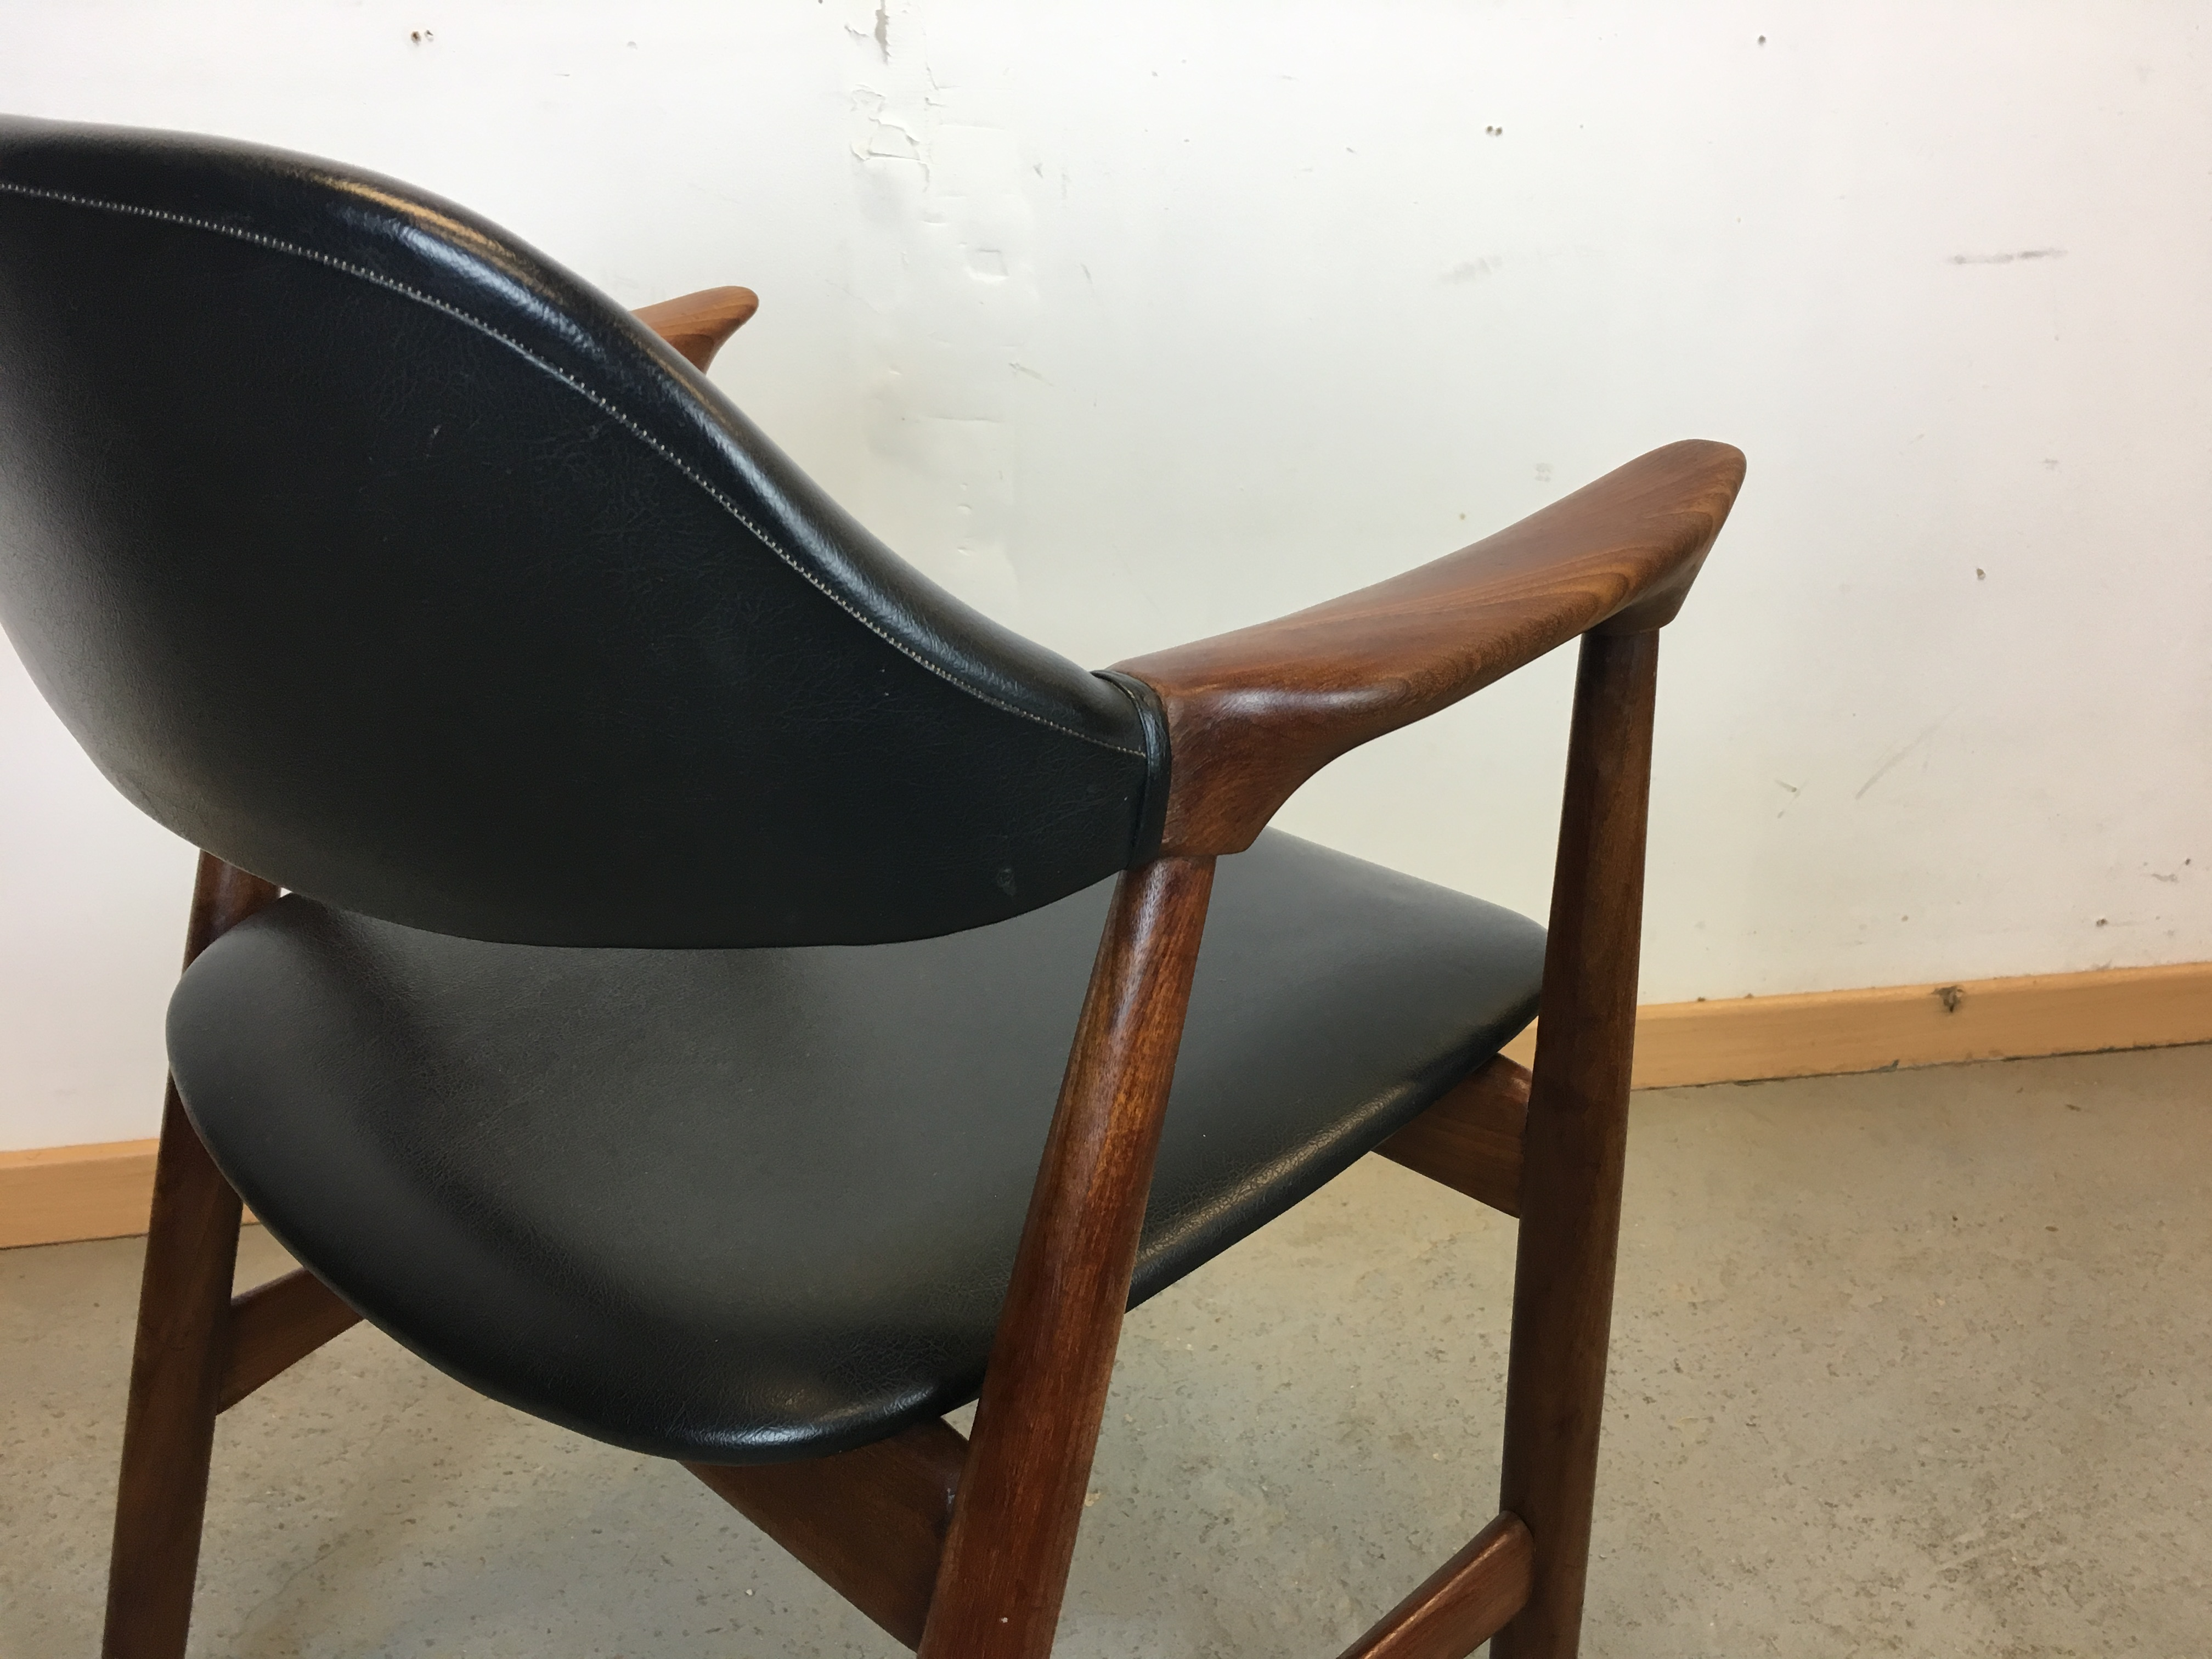 fauteuil scandinave ann e 60 chair danish 60 s. Black Bedroom Furniture Sets. Home Design Ideas